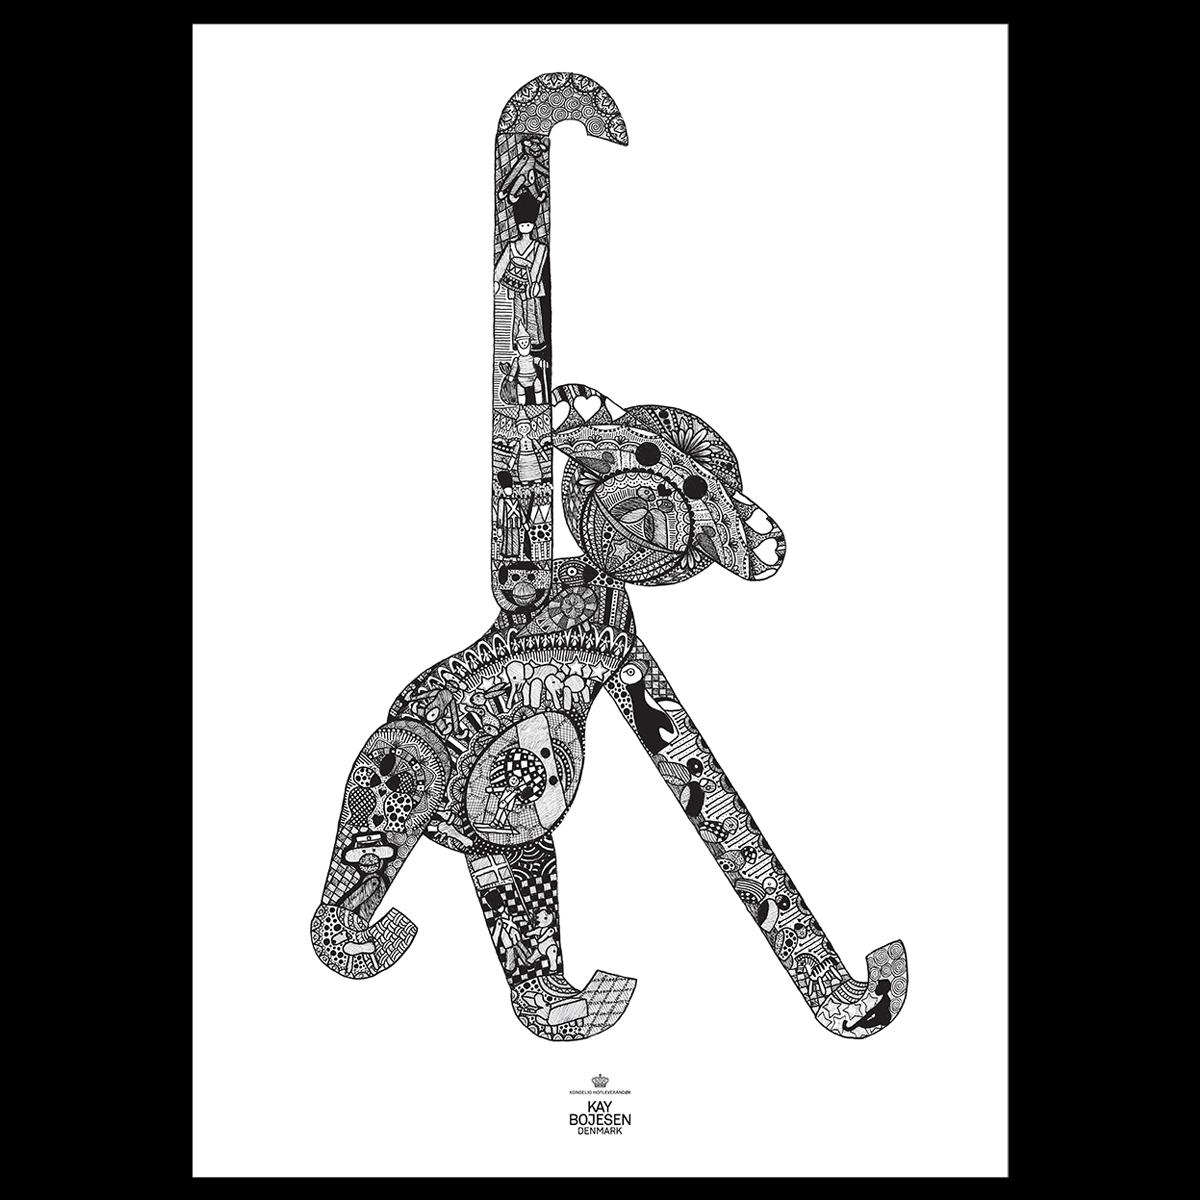 Kay Bojesen - Monkey Poster 50 x 70 cm - Black/White  (39488)